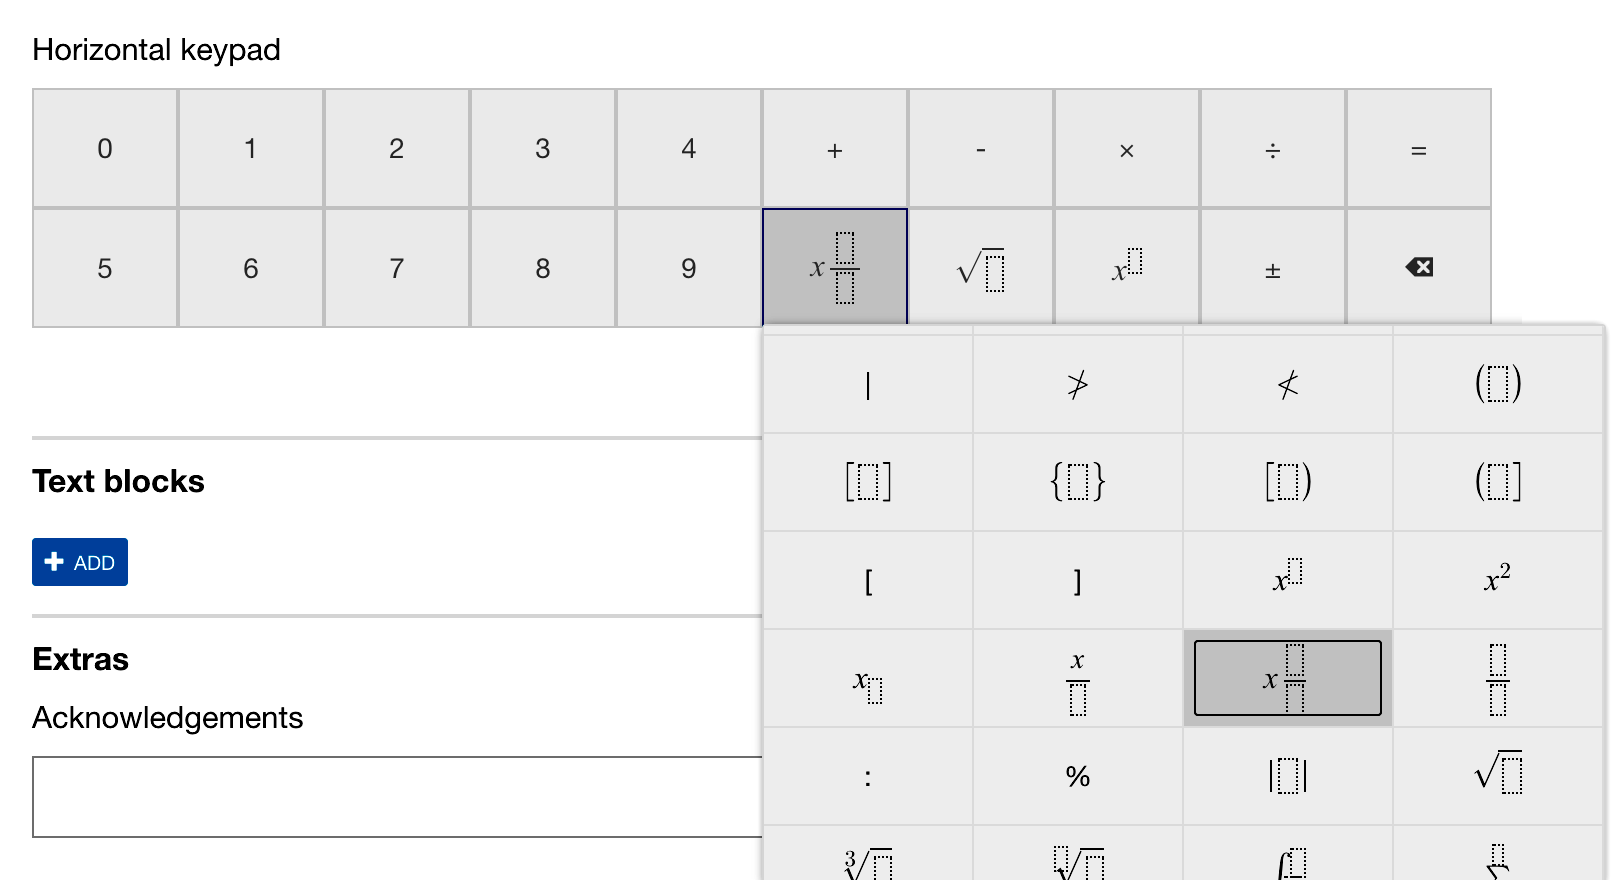 Customising the horizontal keypad